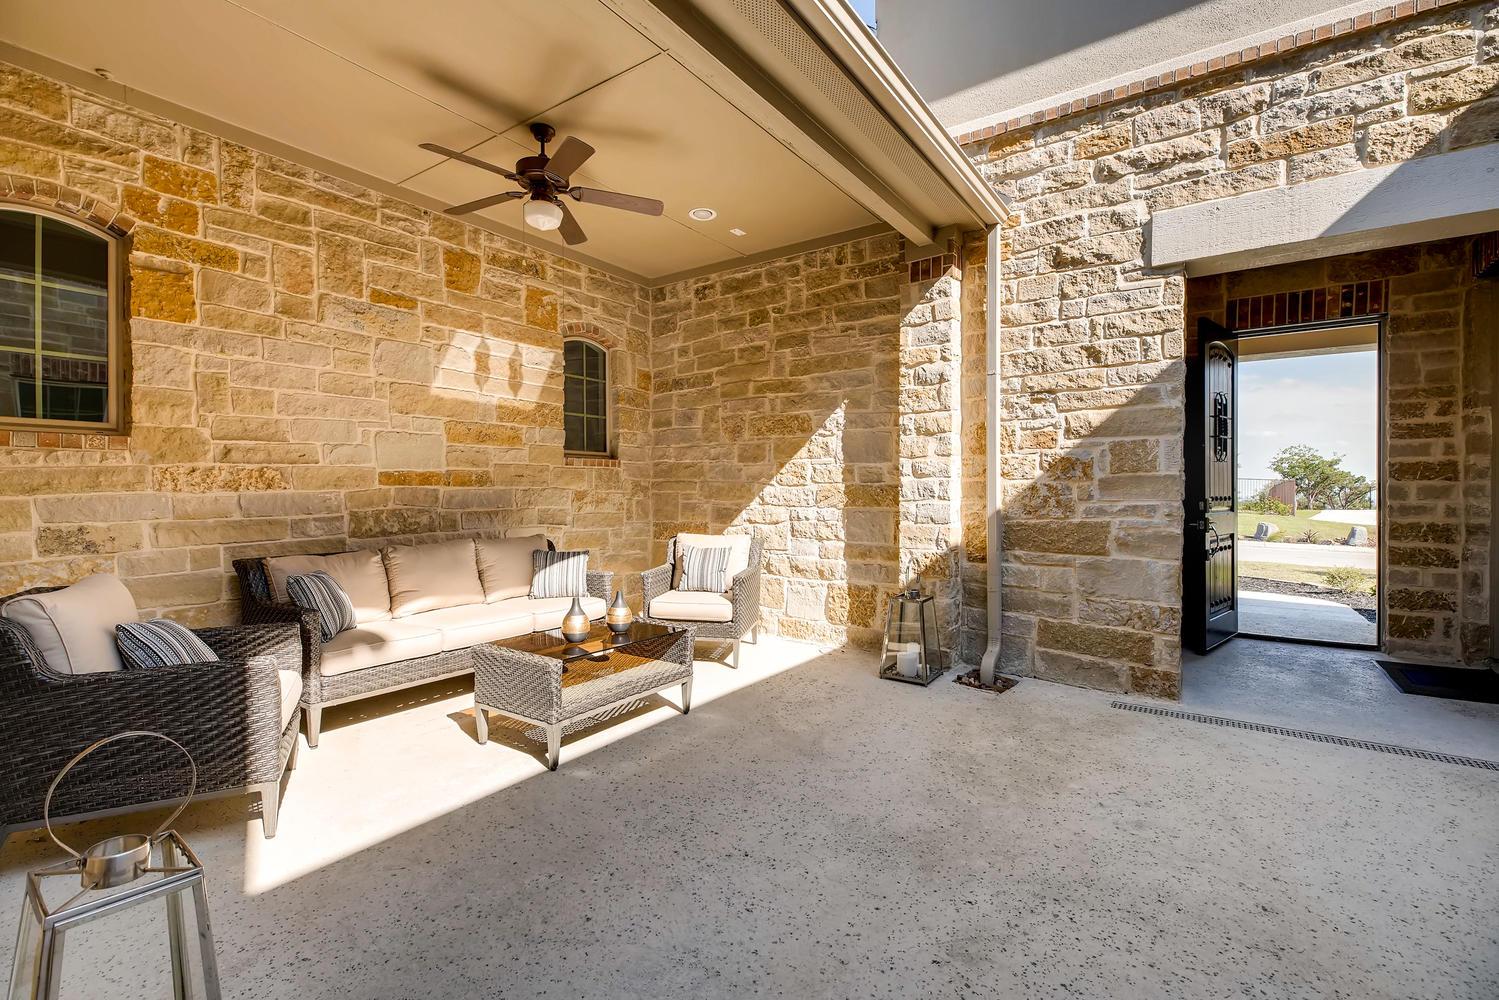 7847 Vanity Hill San Antonio-large-027-27-Courtyard-1500x1000-72dpi.jpg